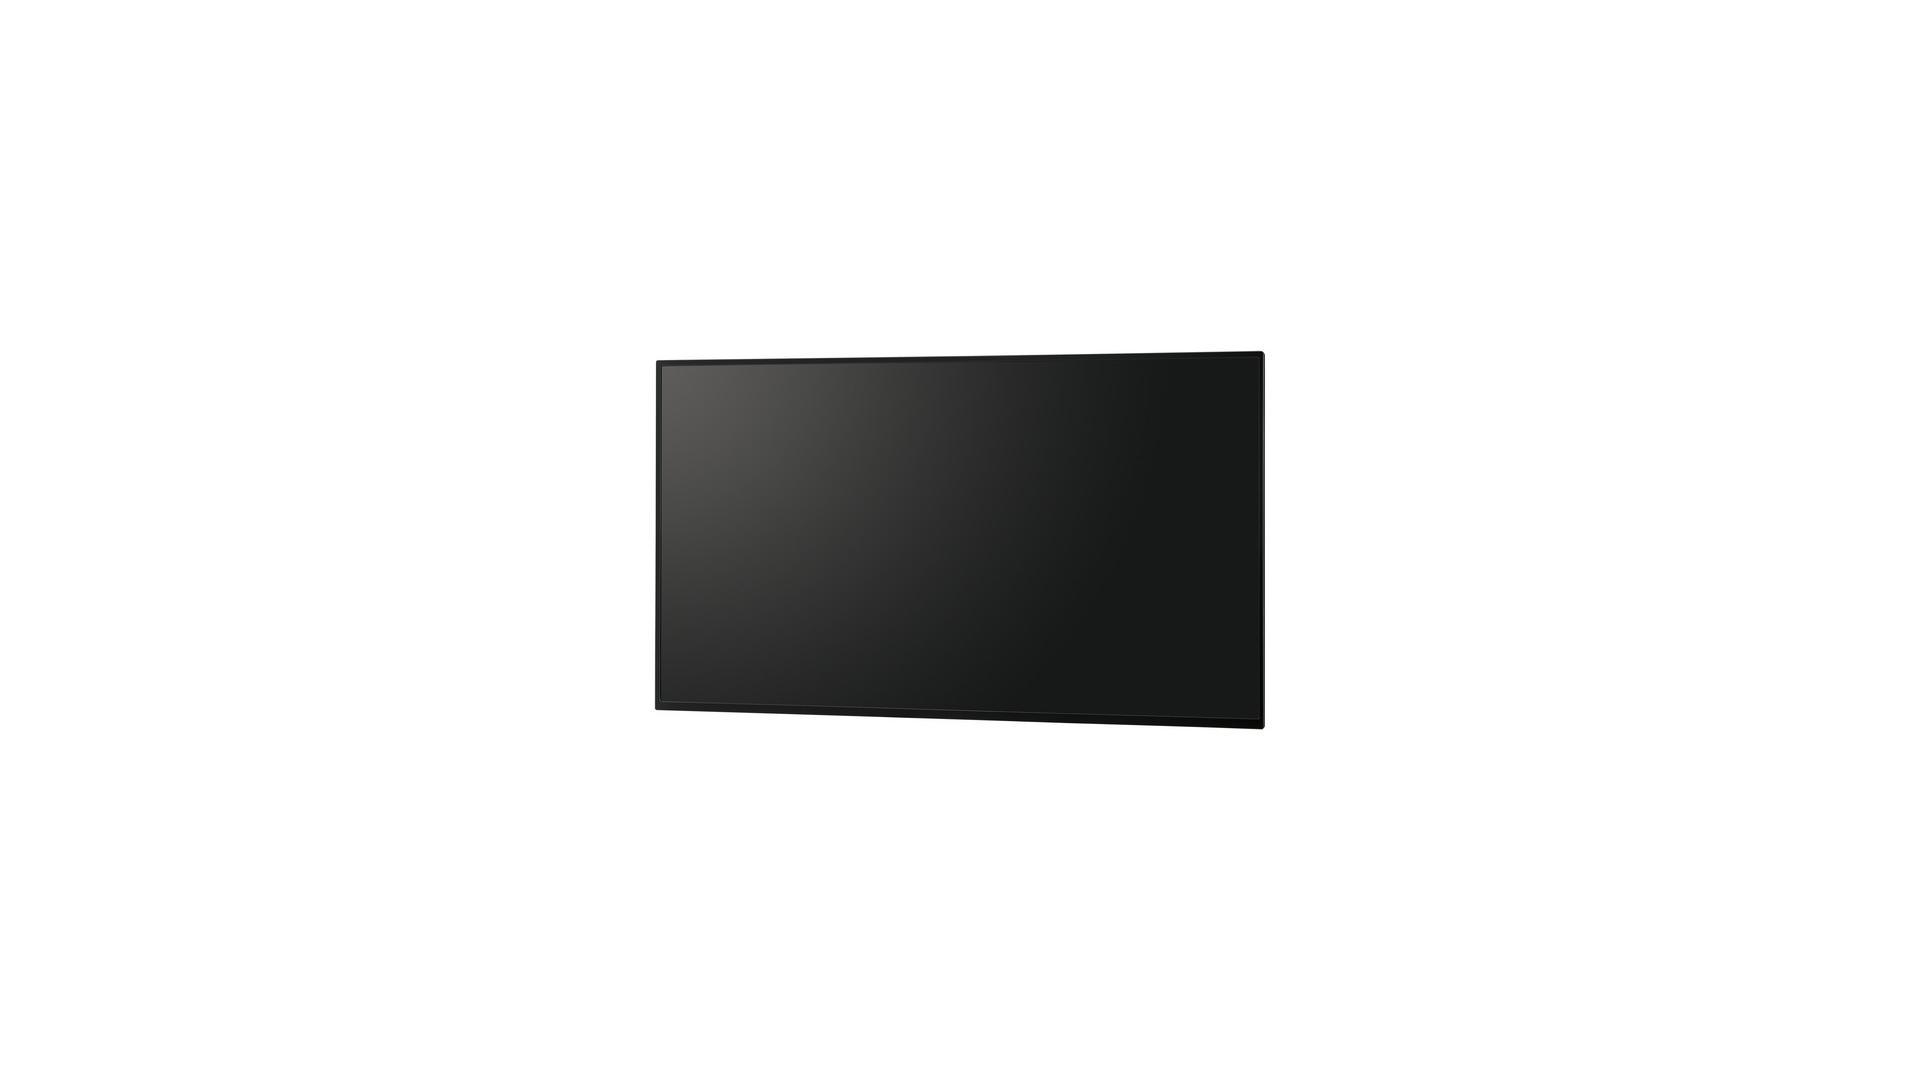 Sharp-PNY436P-Display_1